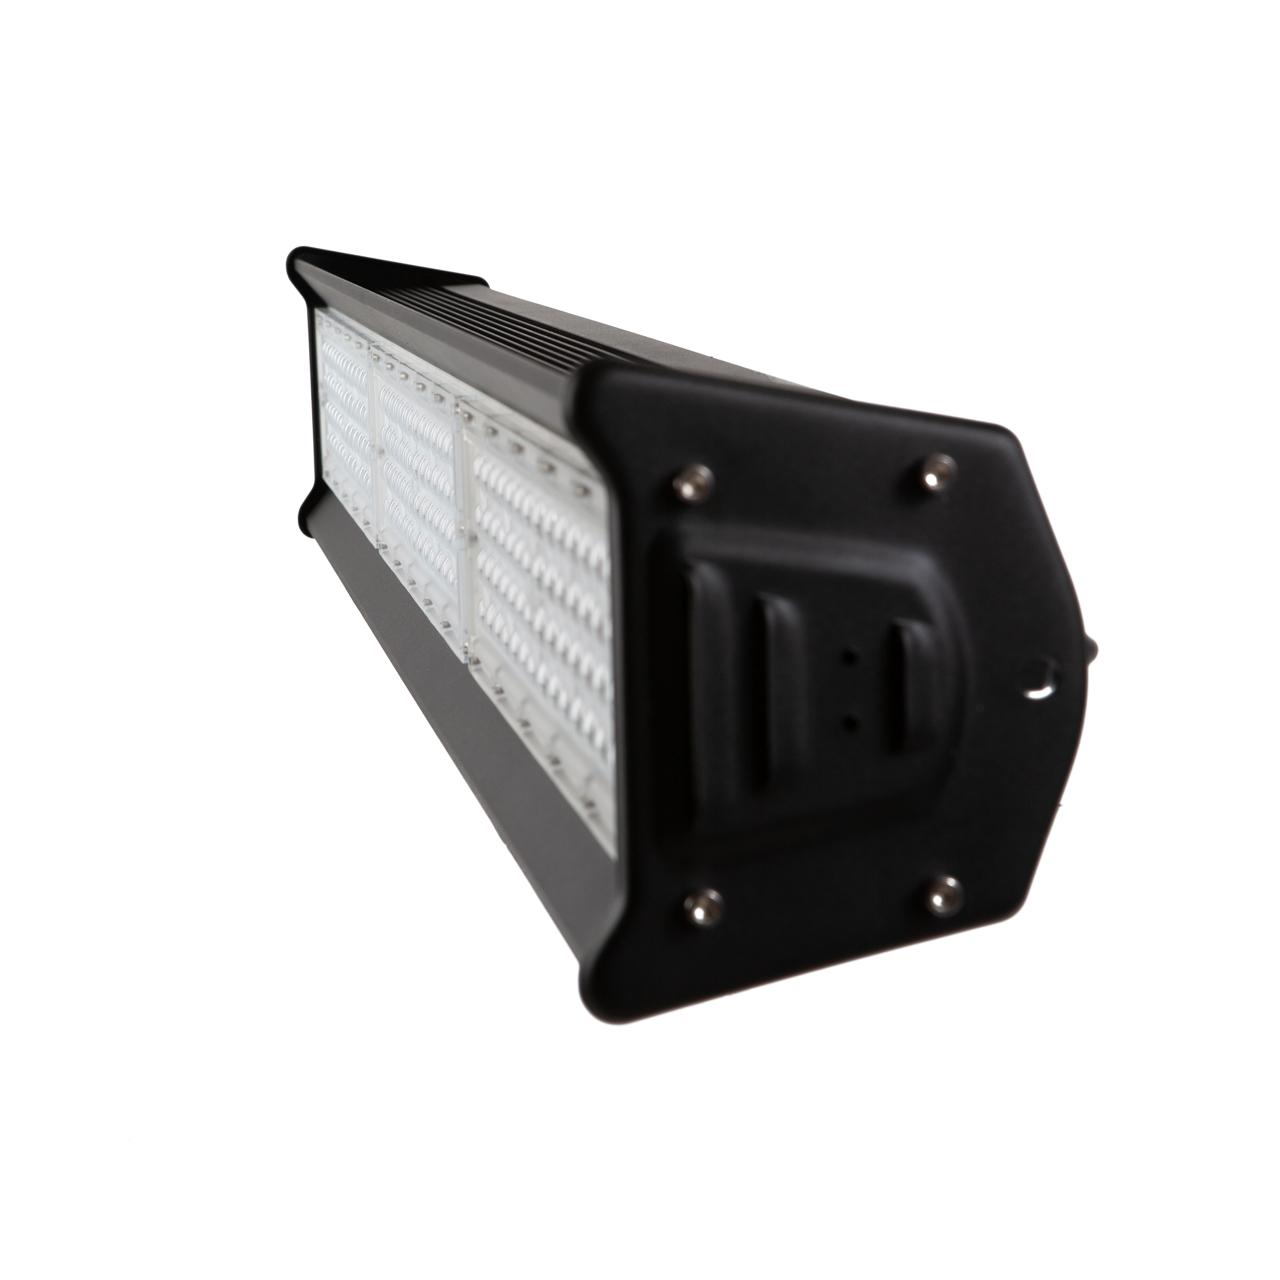 MUVA LED - Hallenbeleuchtung Linear